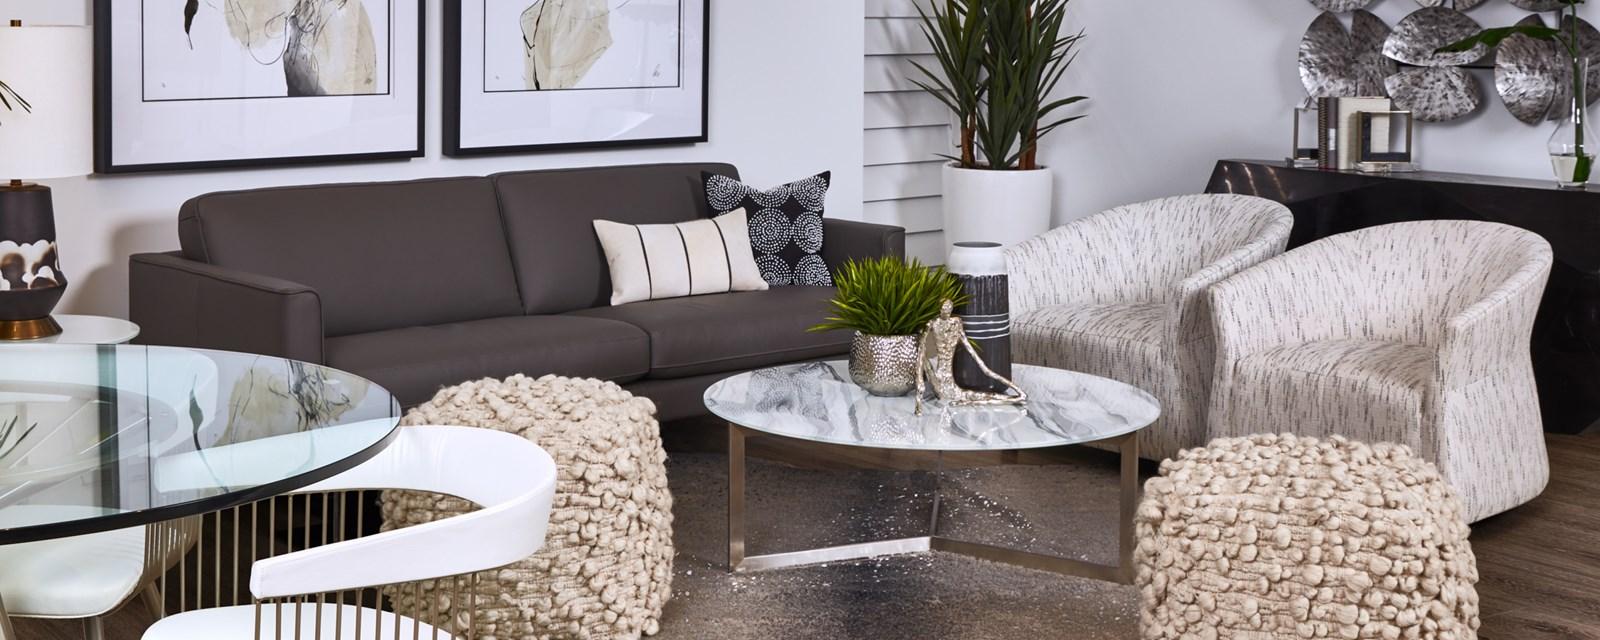 Leather Sofas & Loveseats